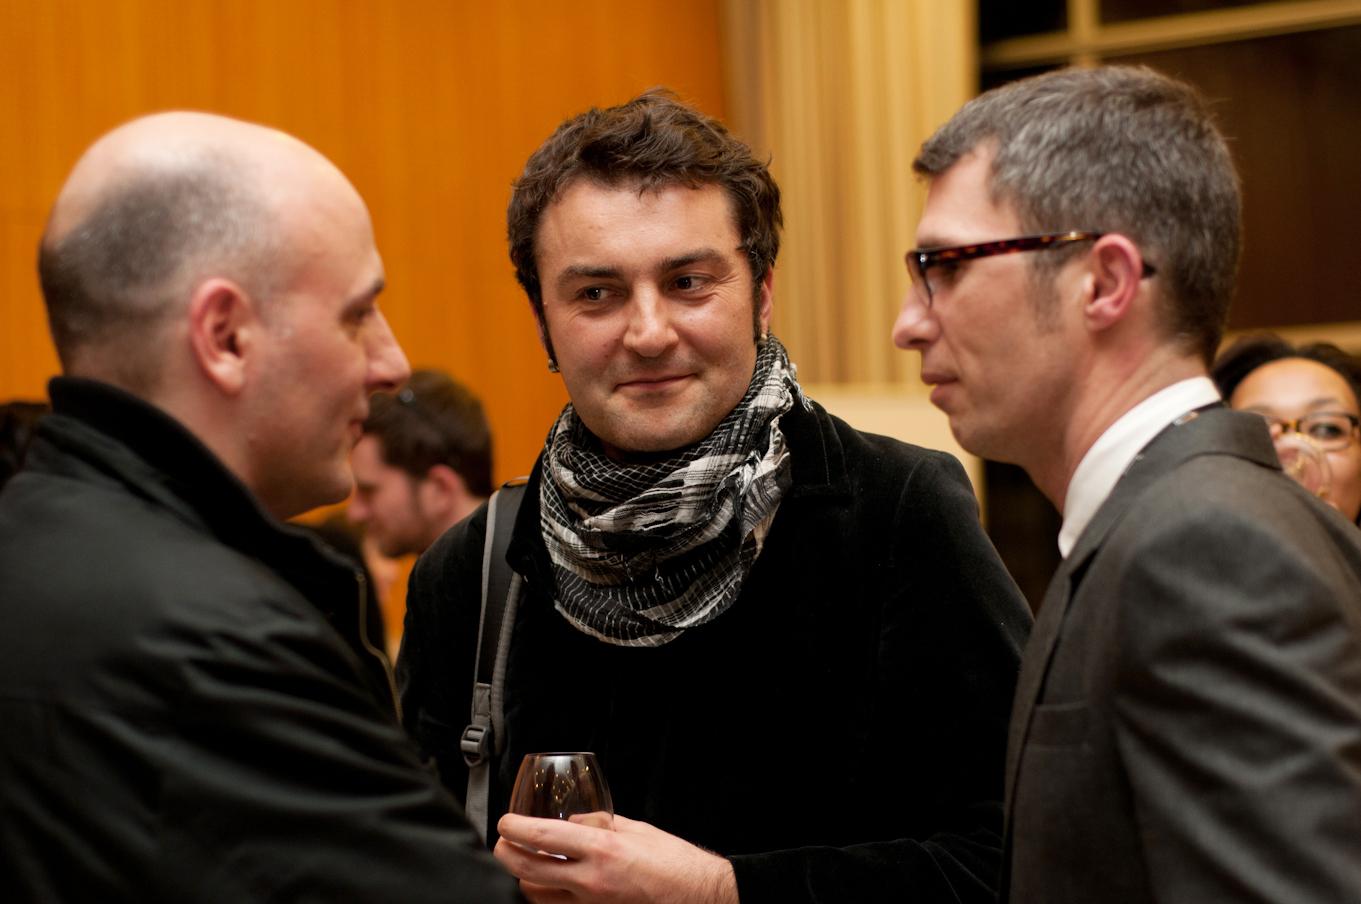 Etoiles Francophones - Ouverture | Olivier Bruand, Guillaume Mainguet et Vincent Godard